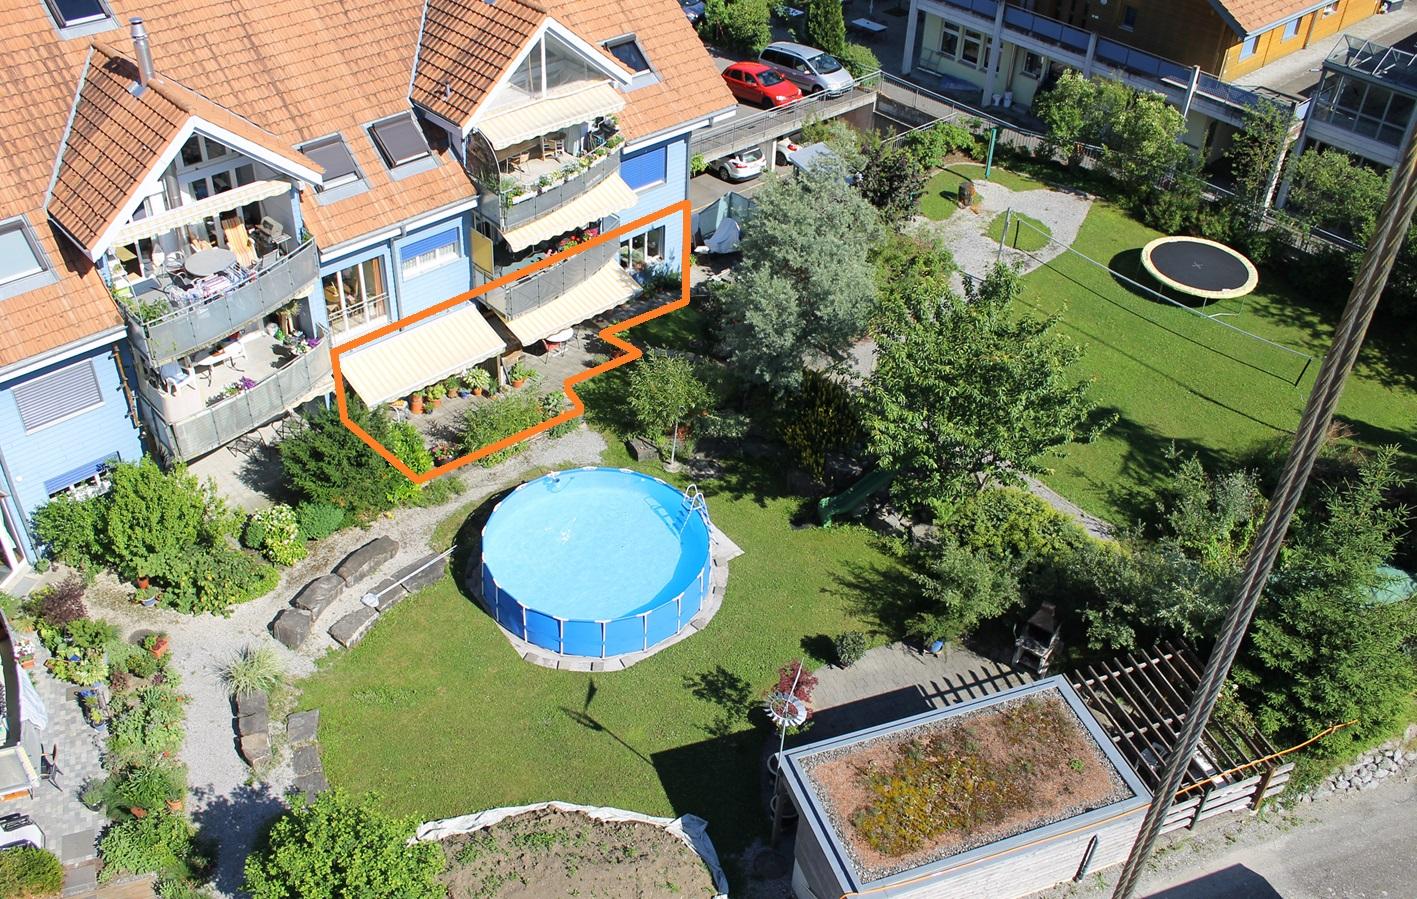 Mehrfamilienhaus mit Innenhof